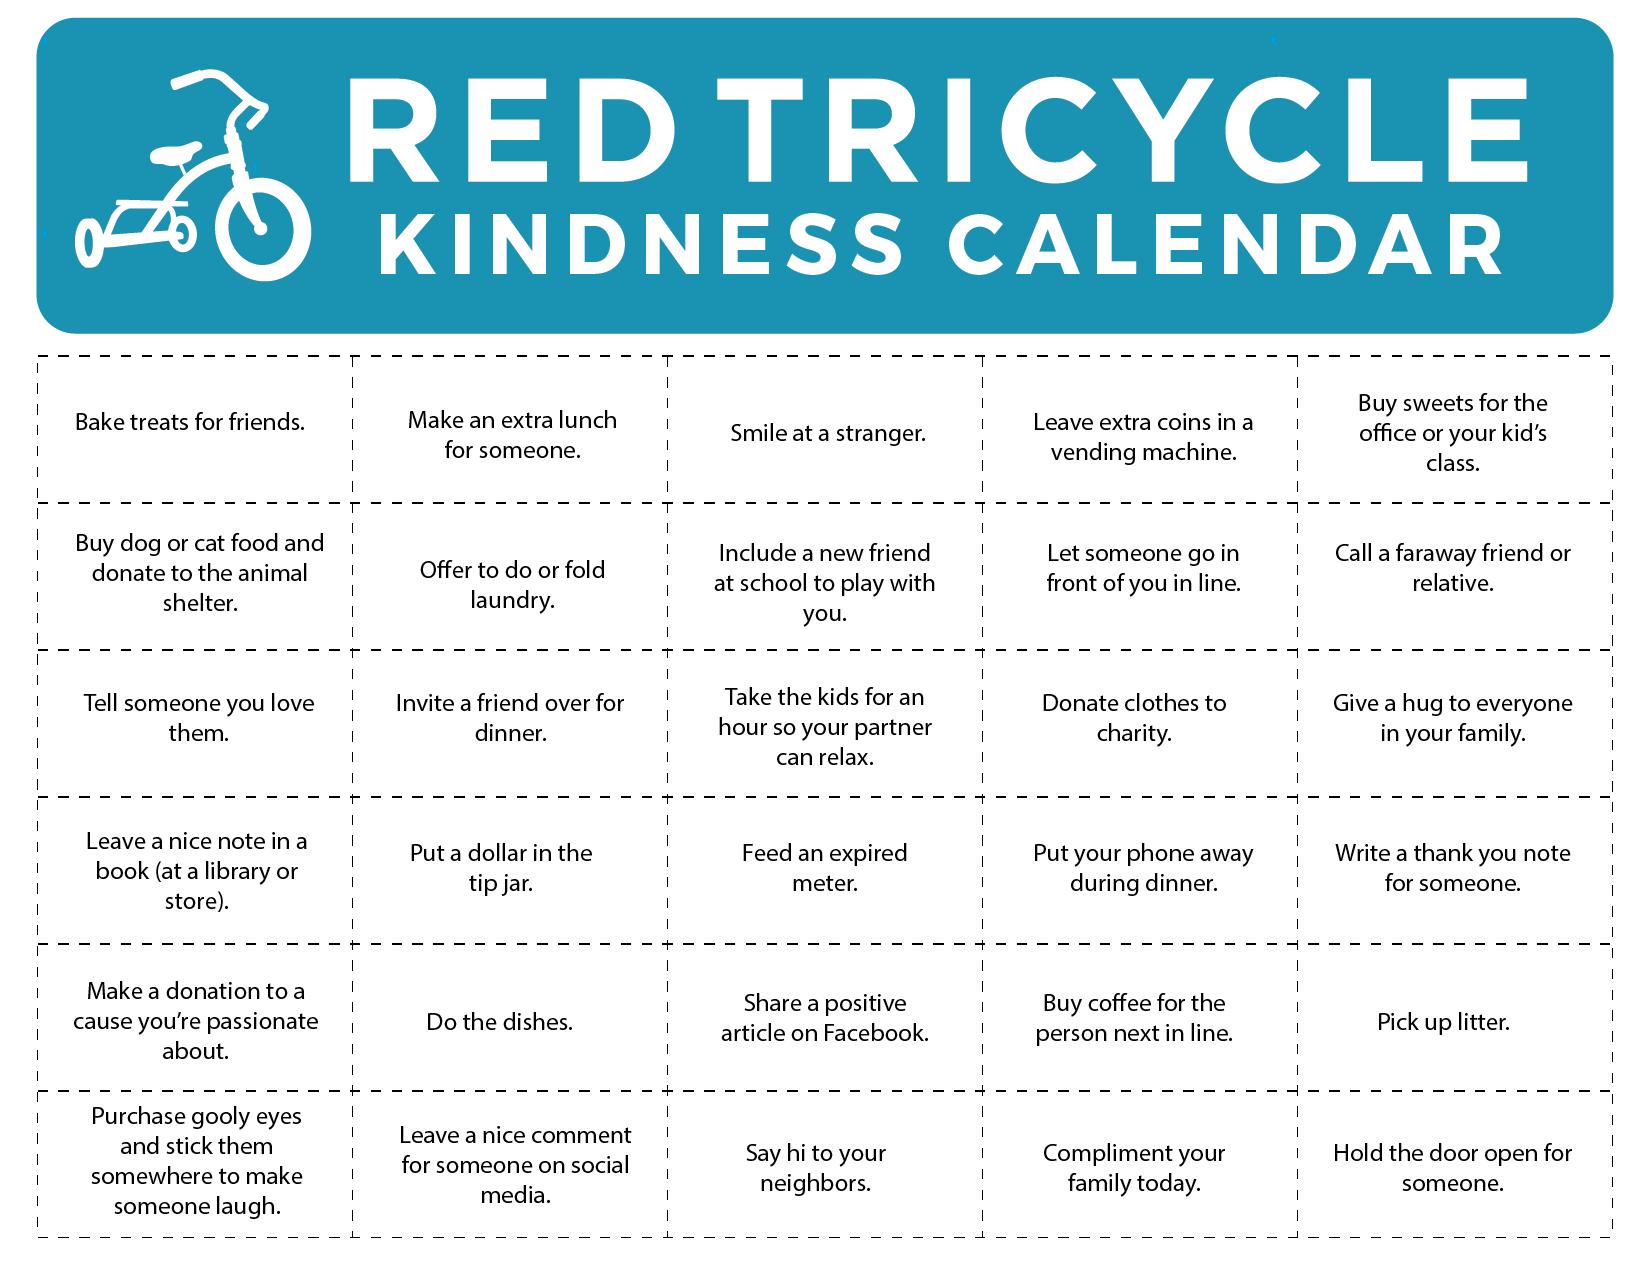 kindness-calendar-01